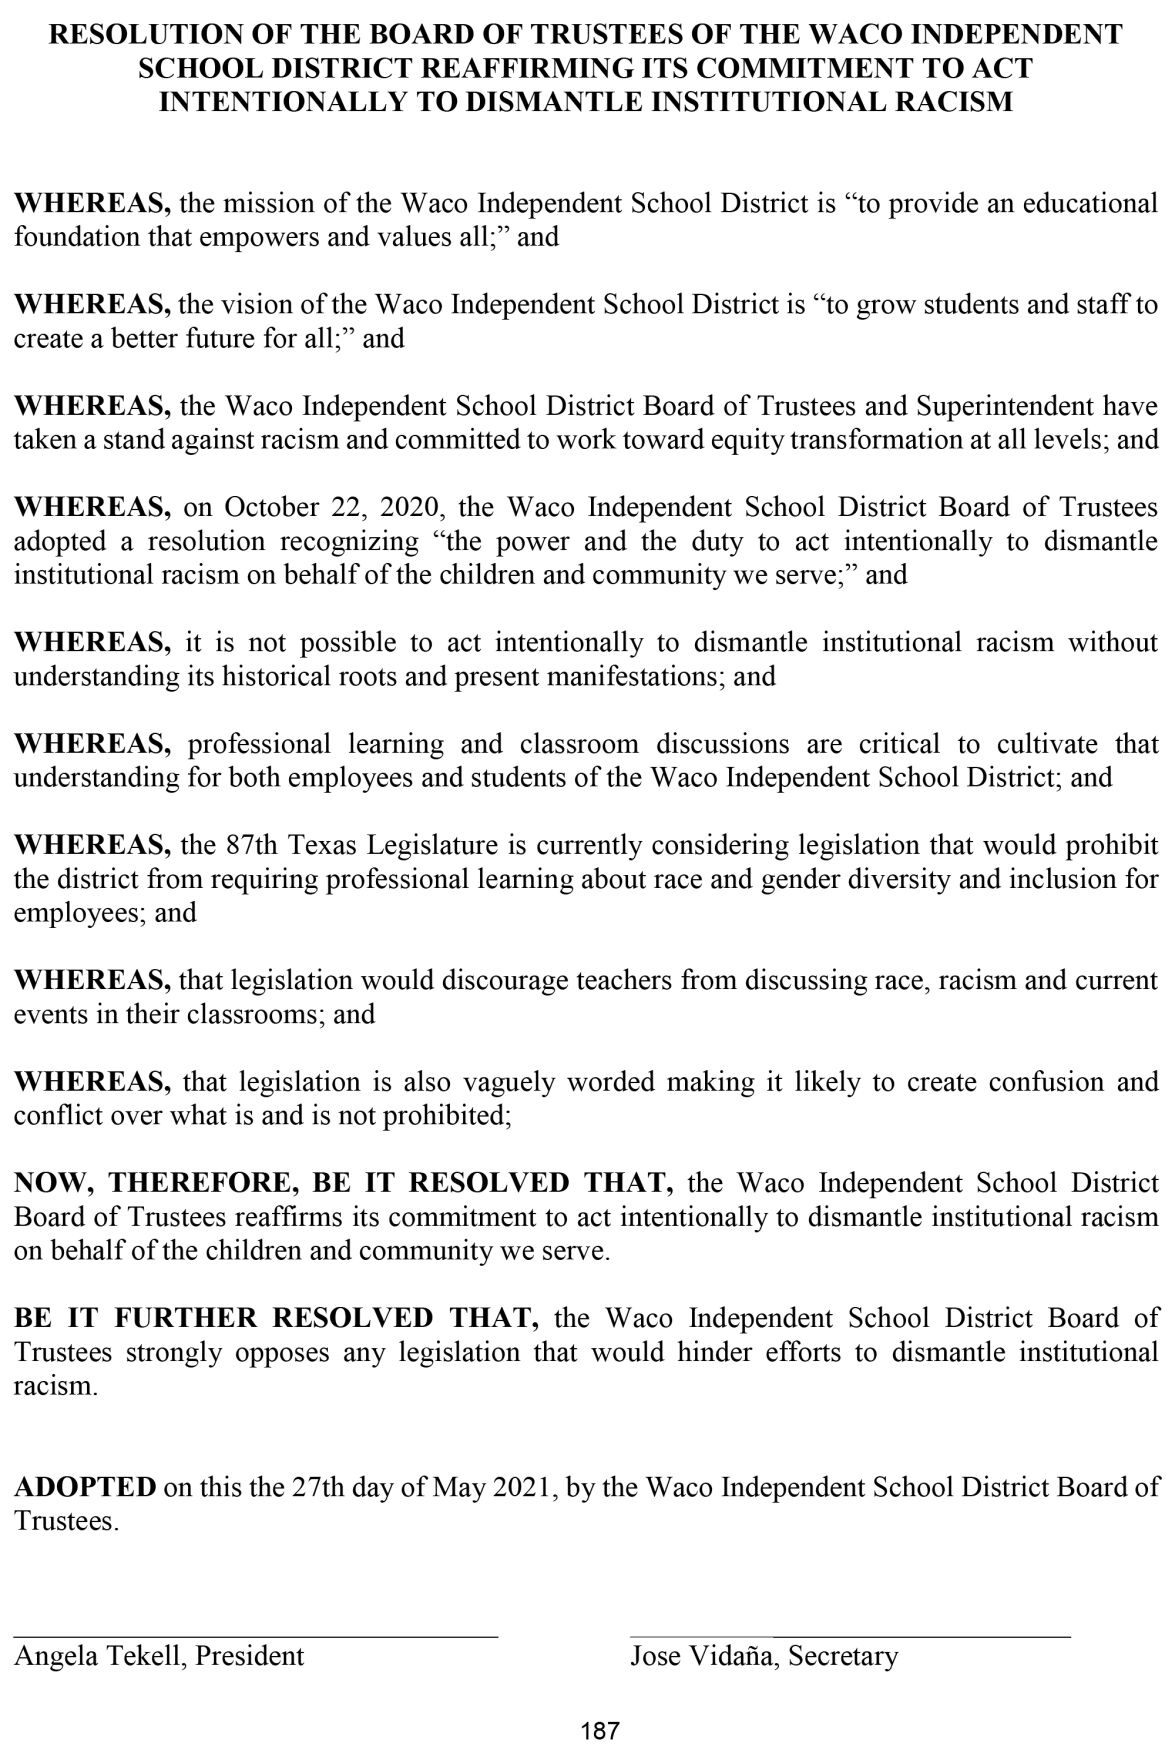 Waco ISD anti-racism resolution